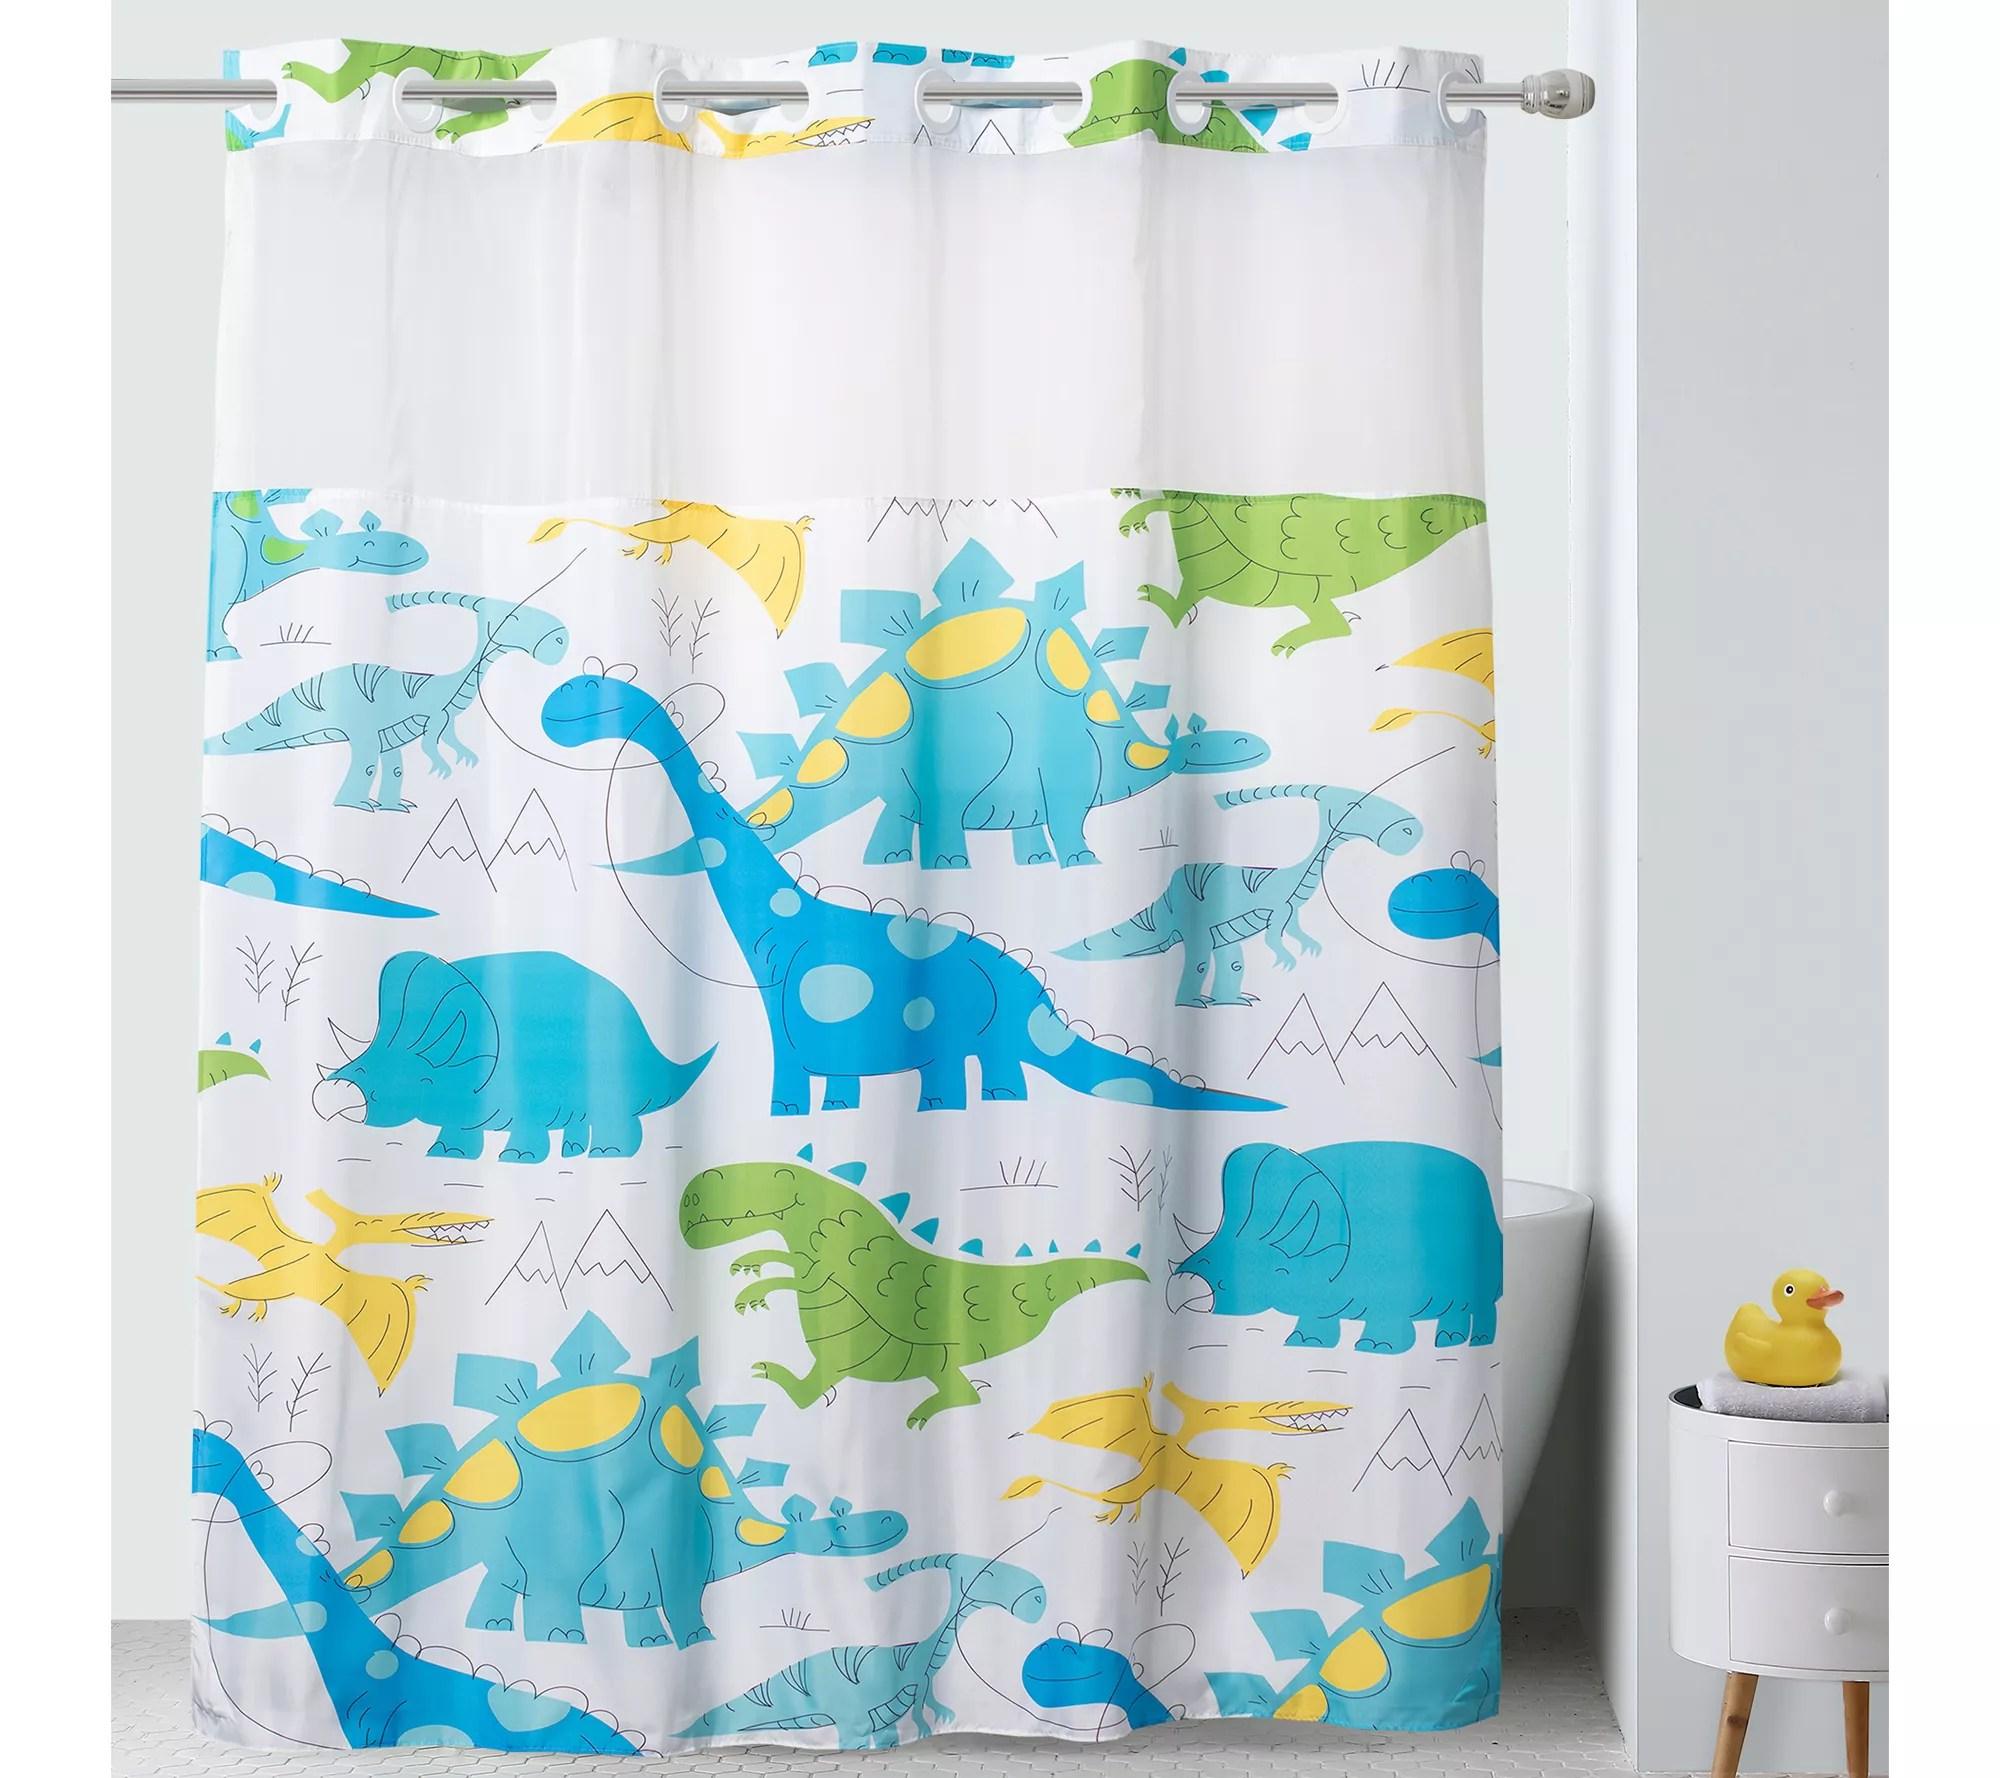 hookless shower curtain for kids dinosaur patt ern qvc com